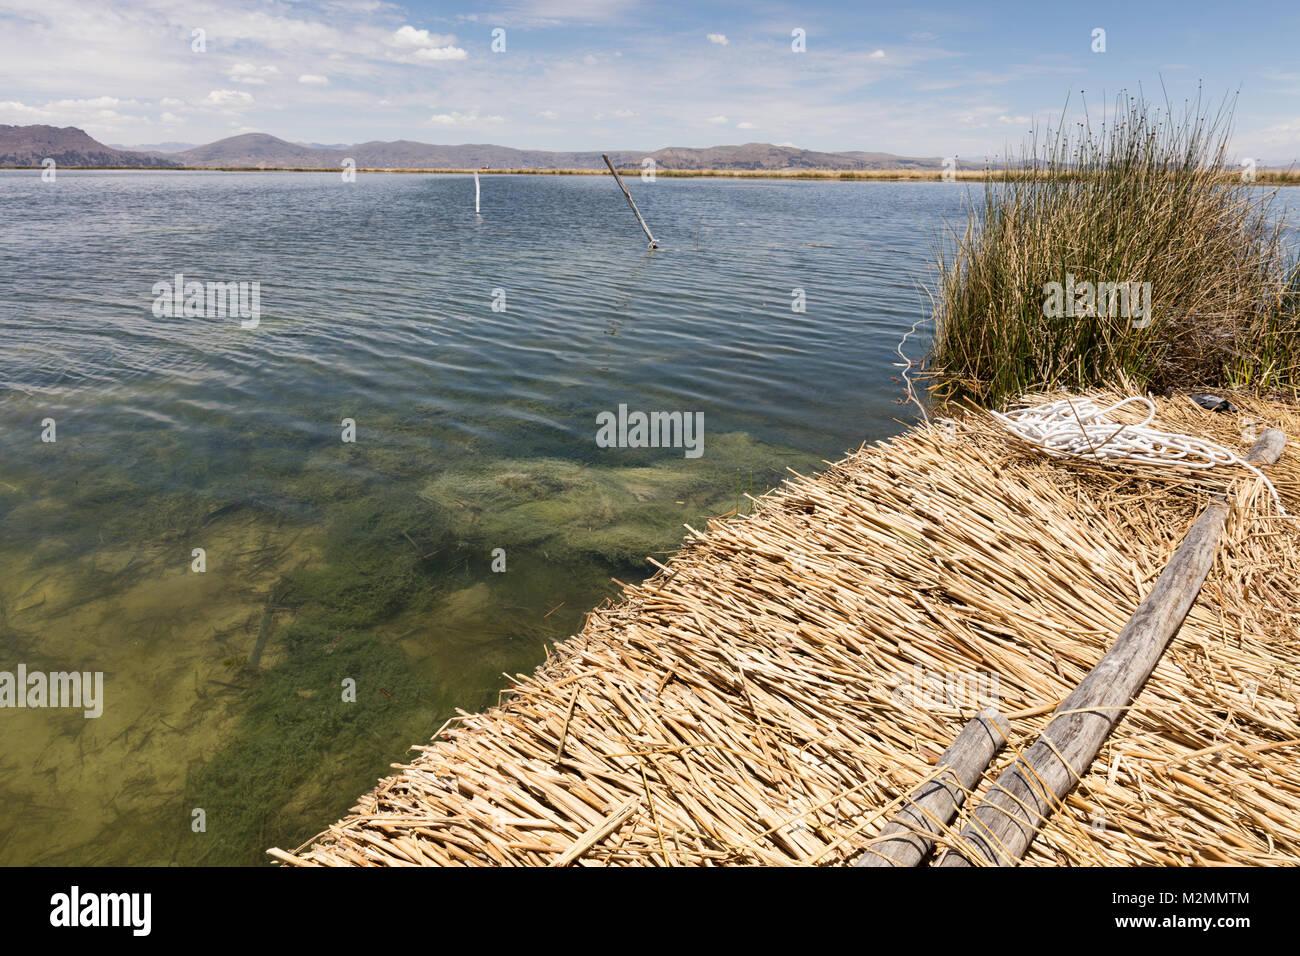 Floating island  on the Titicaca lake near Puno, Peru - Stock Image